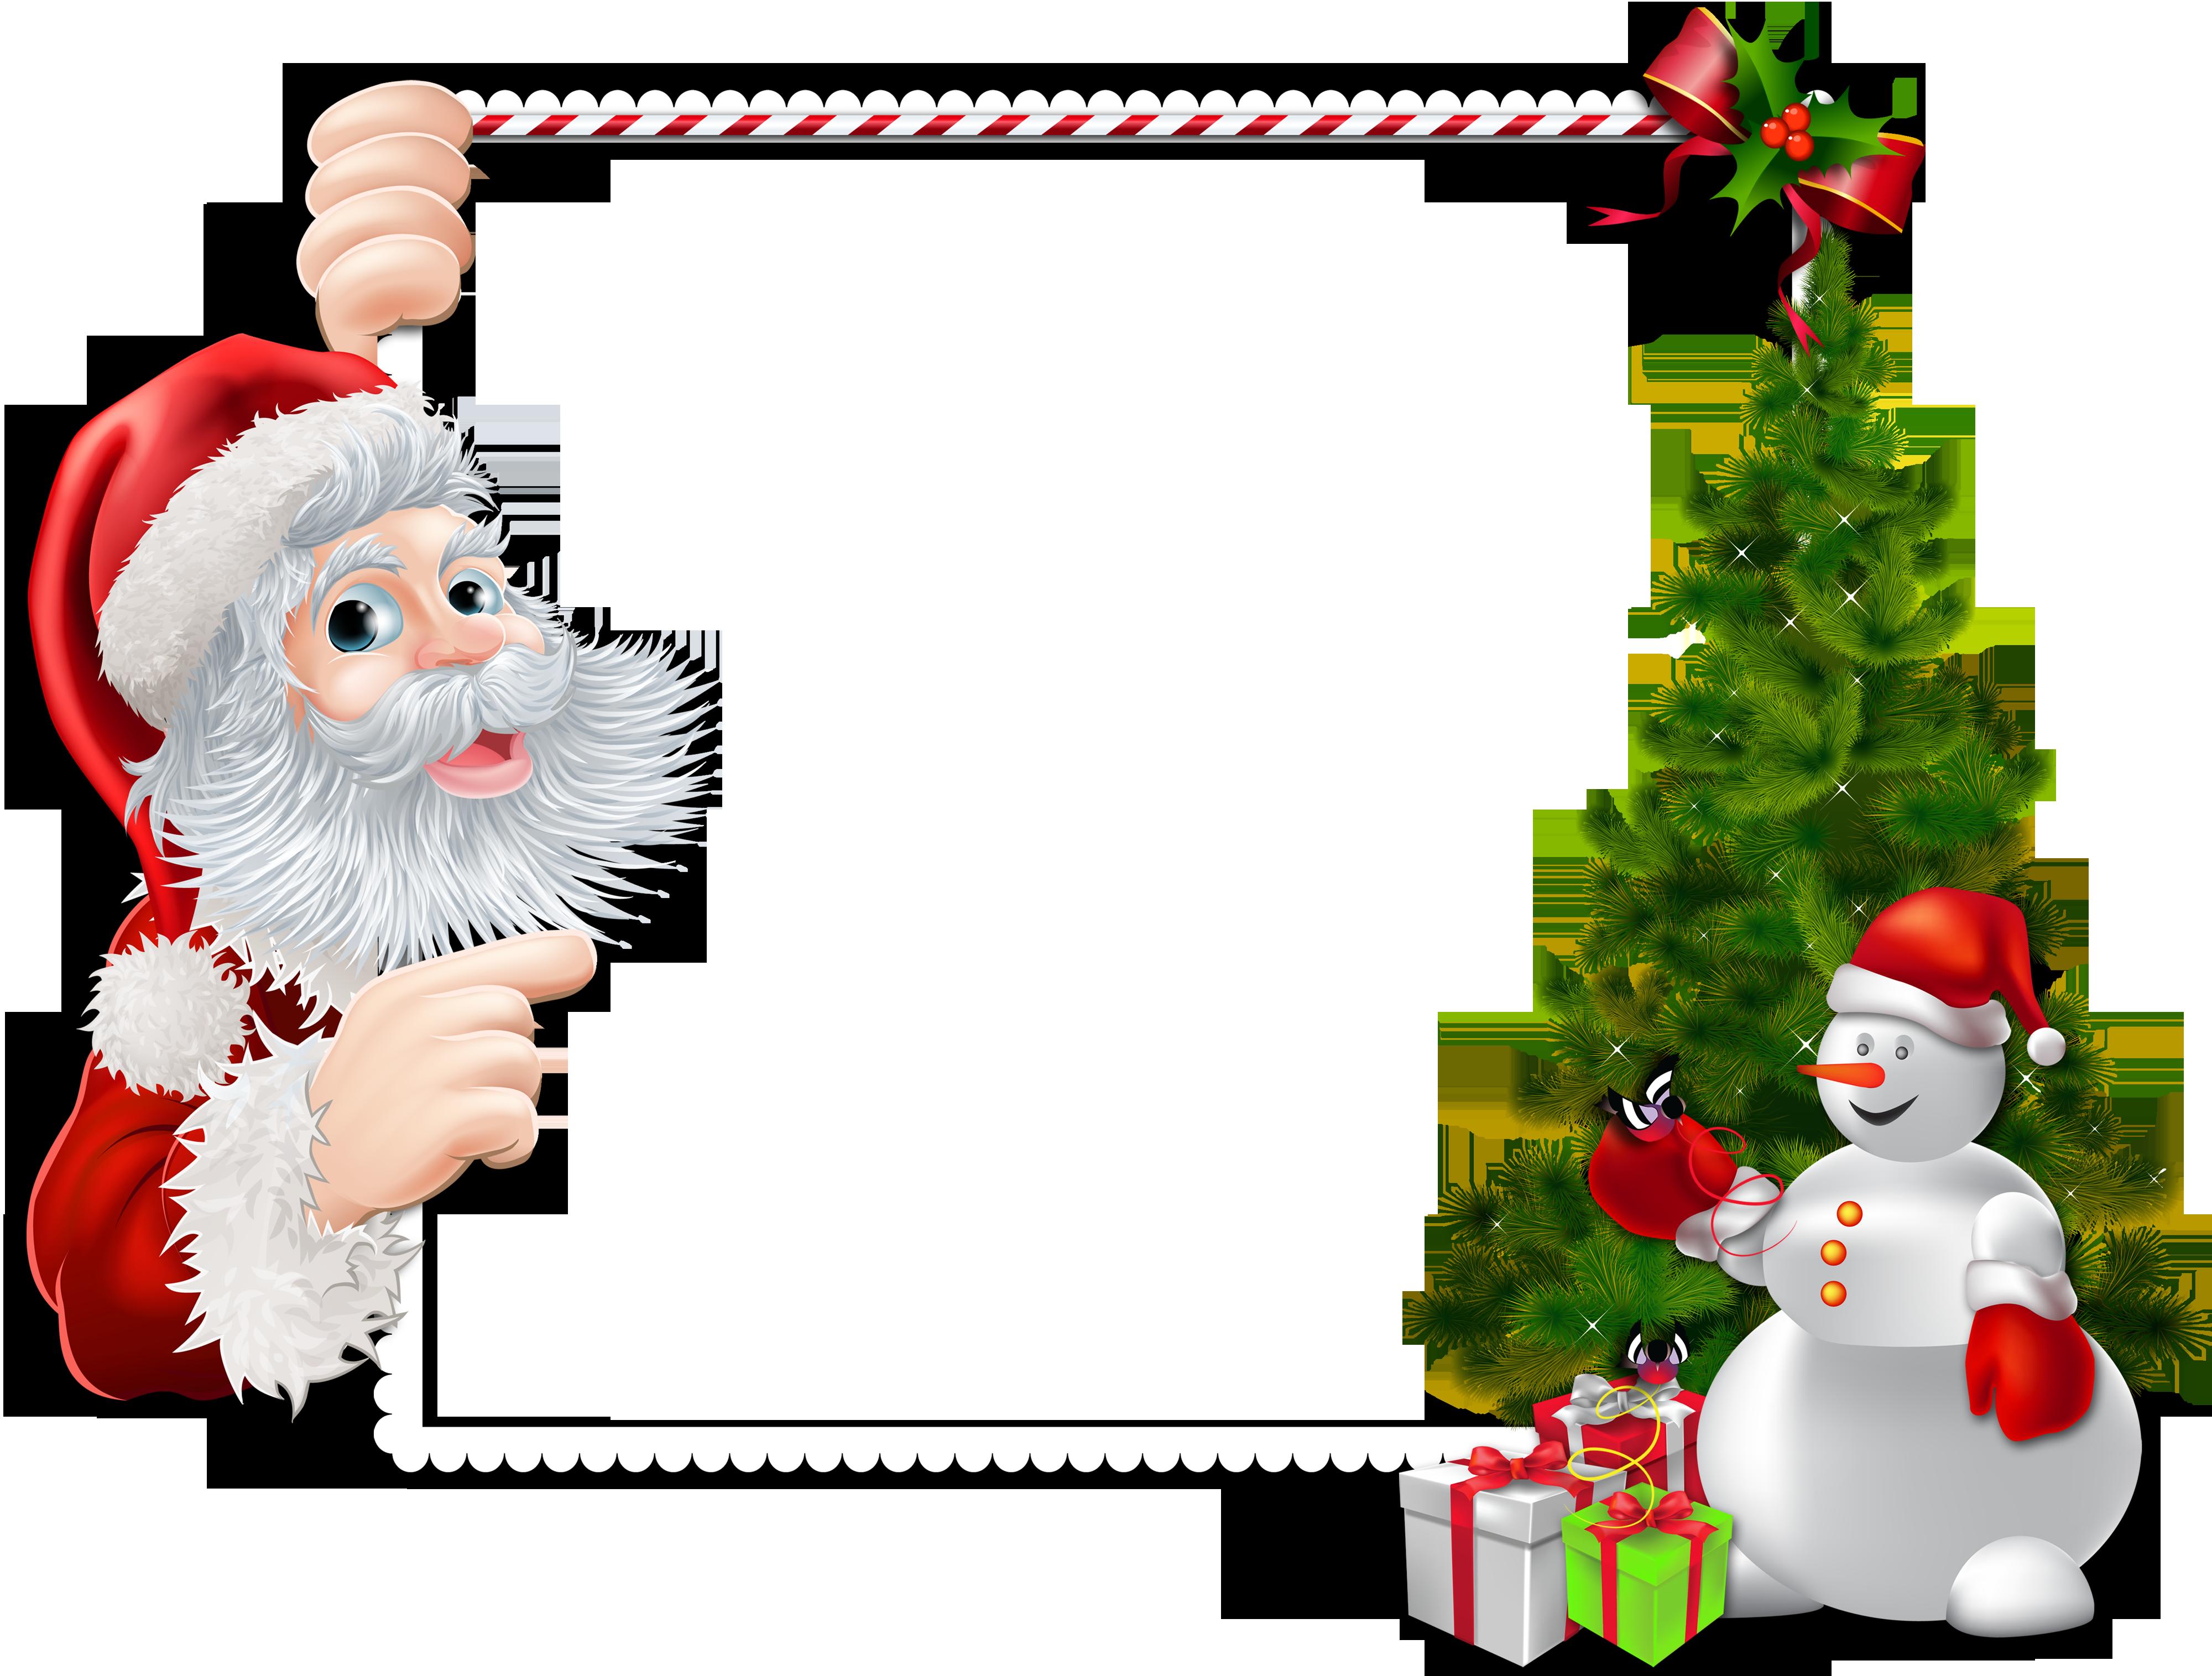 Silviub 12 Months Ago Christmas Christma-Silviub 12 Months Ago Christmas Christmas Frames Frame Png Santa Claus-11